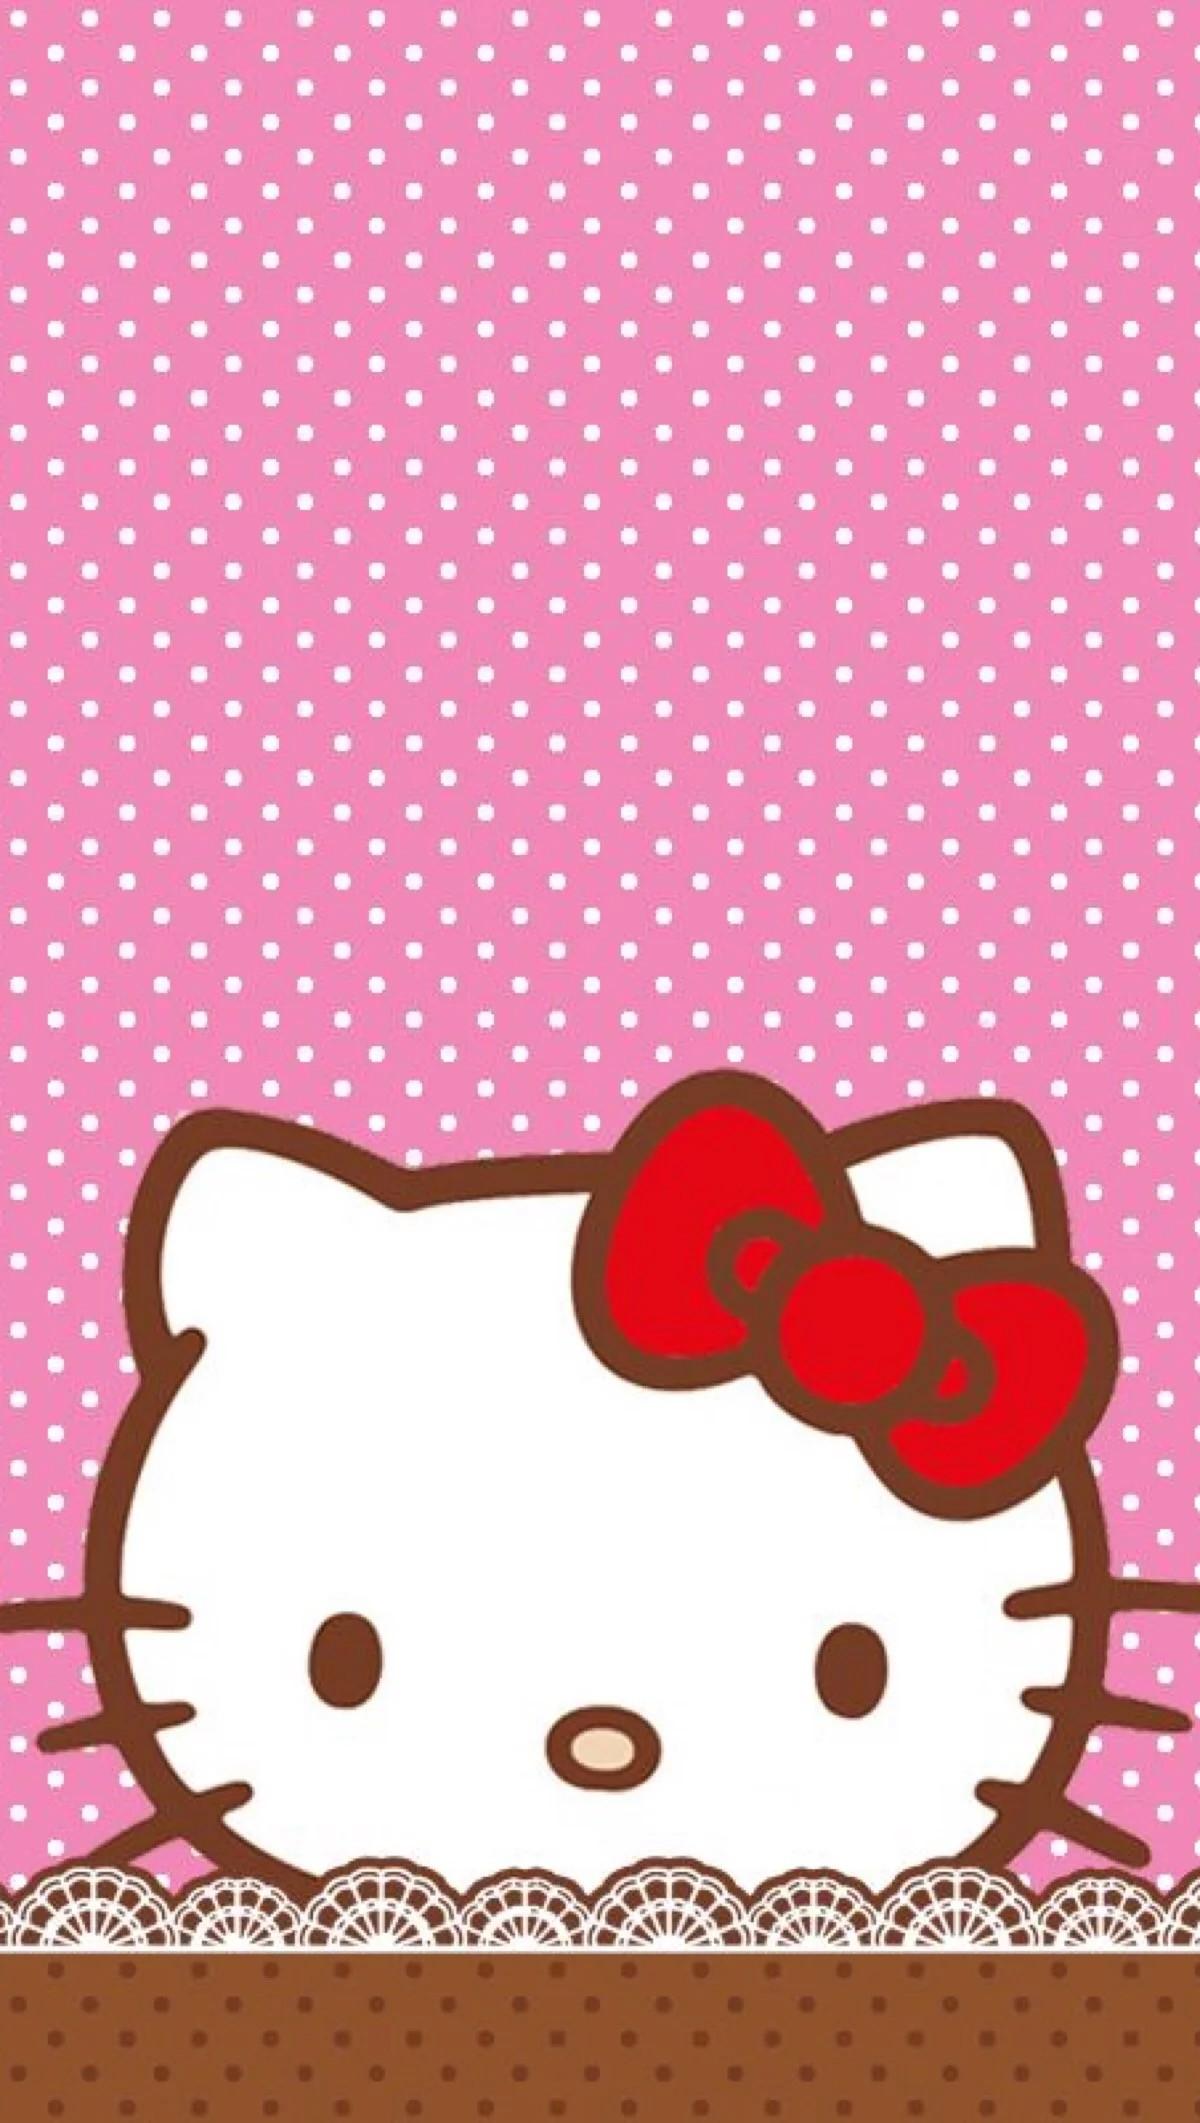 Hello Kitty Wallpaper New Doraemon